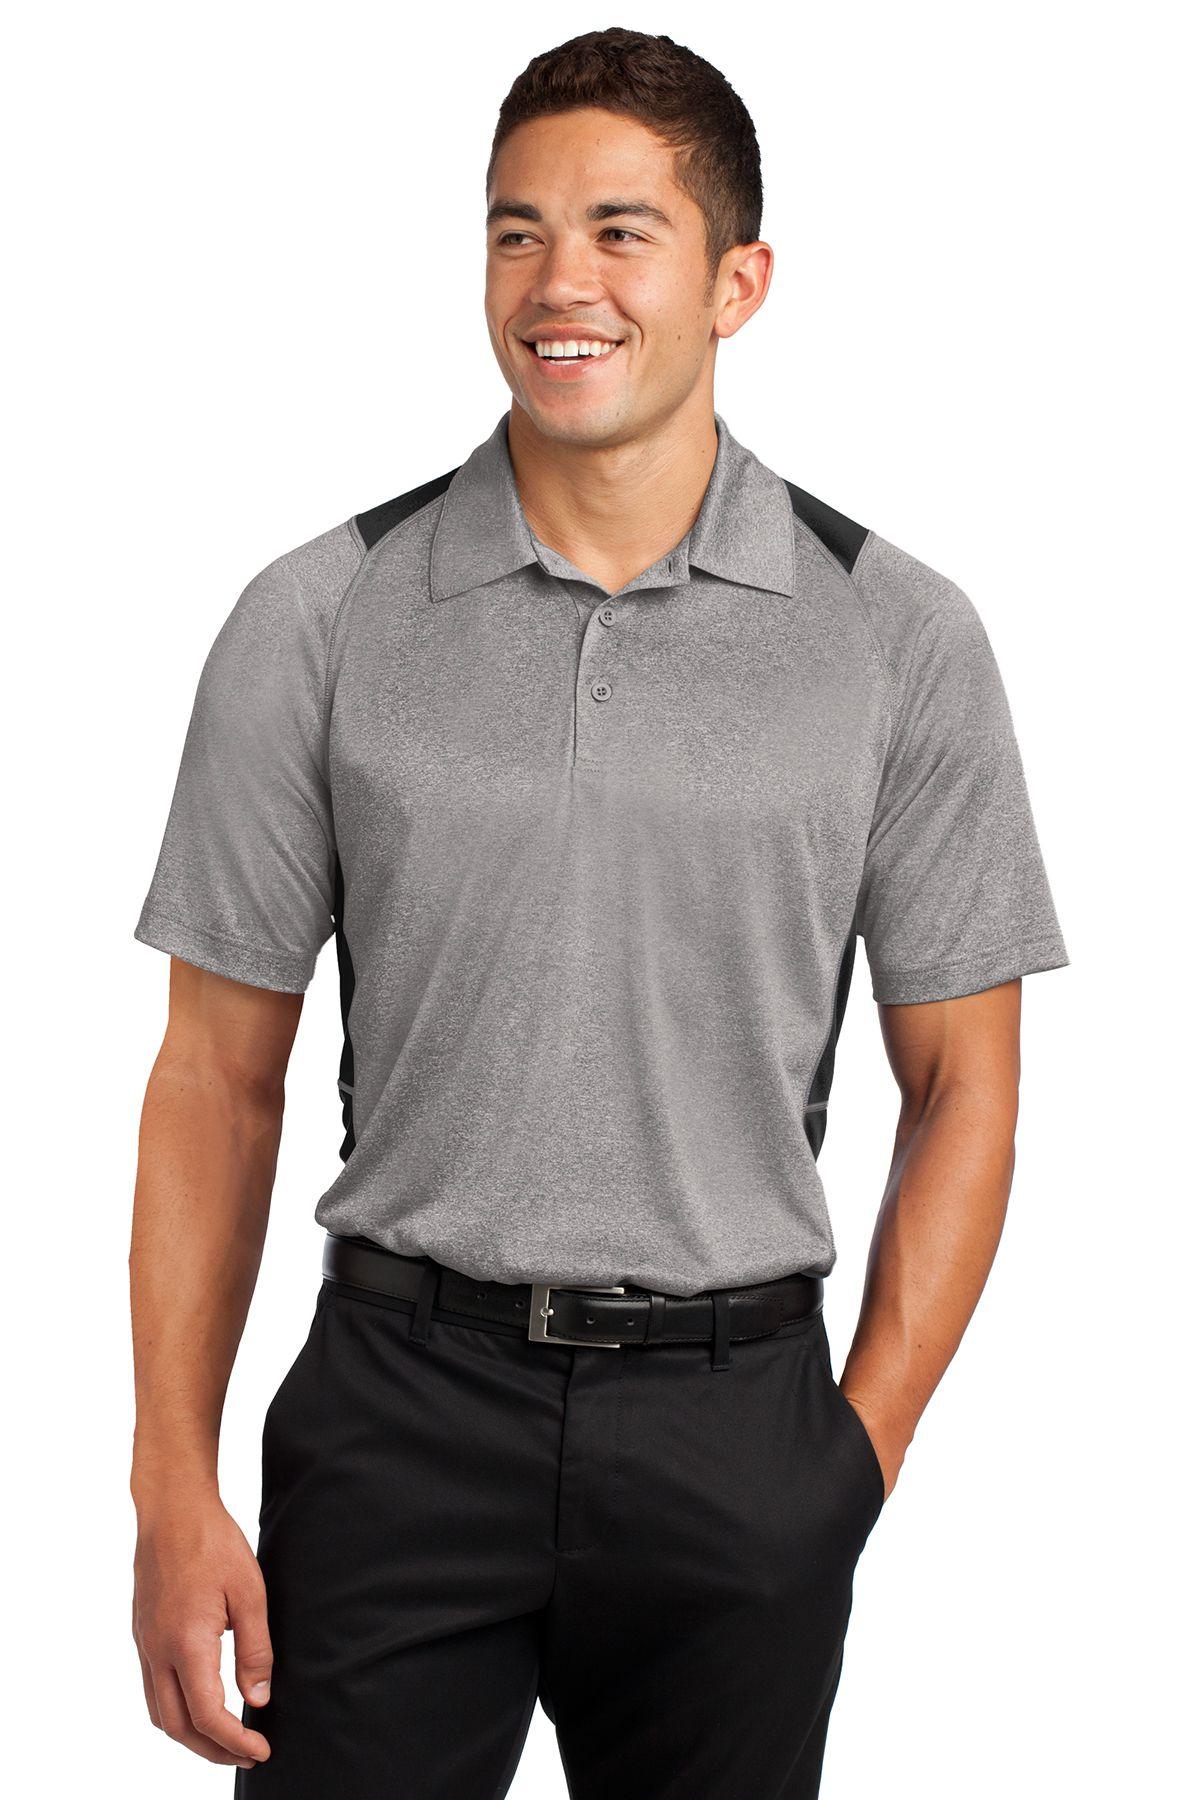 Polos/Knits SanMar Polo collar shirts, Polo, Ladies